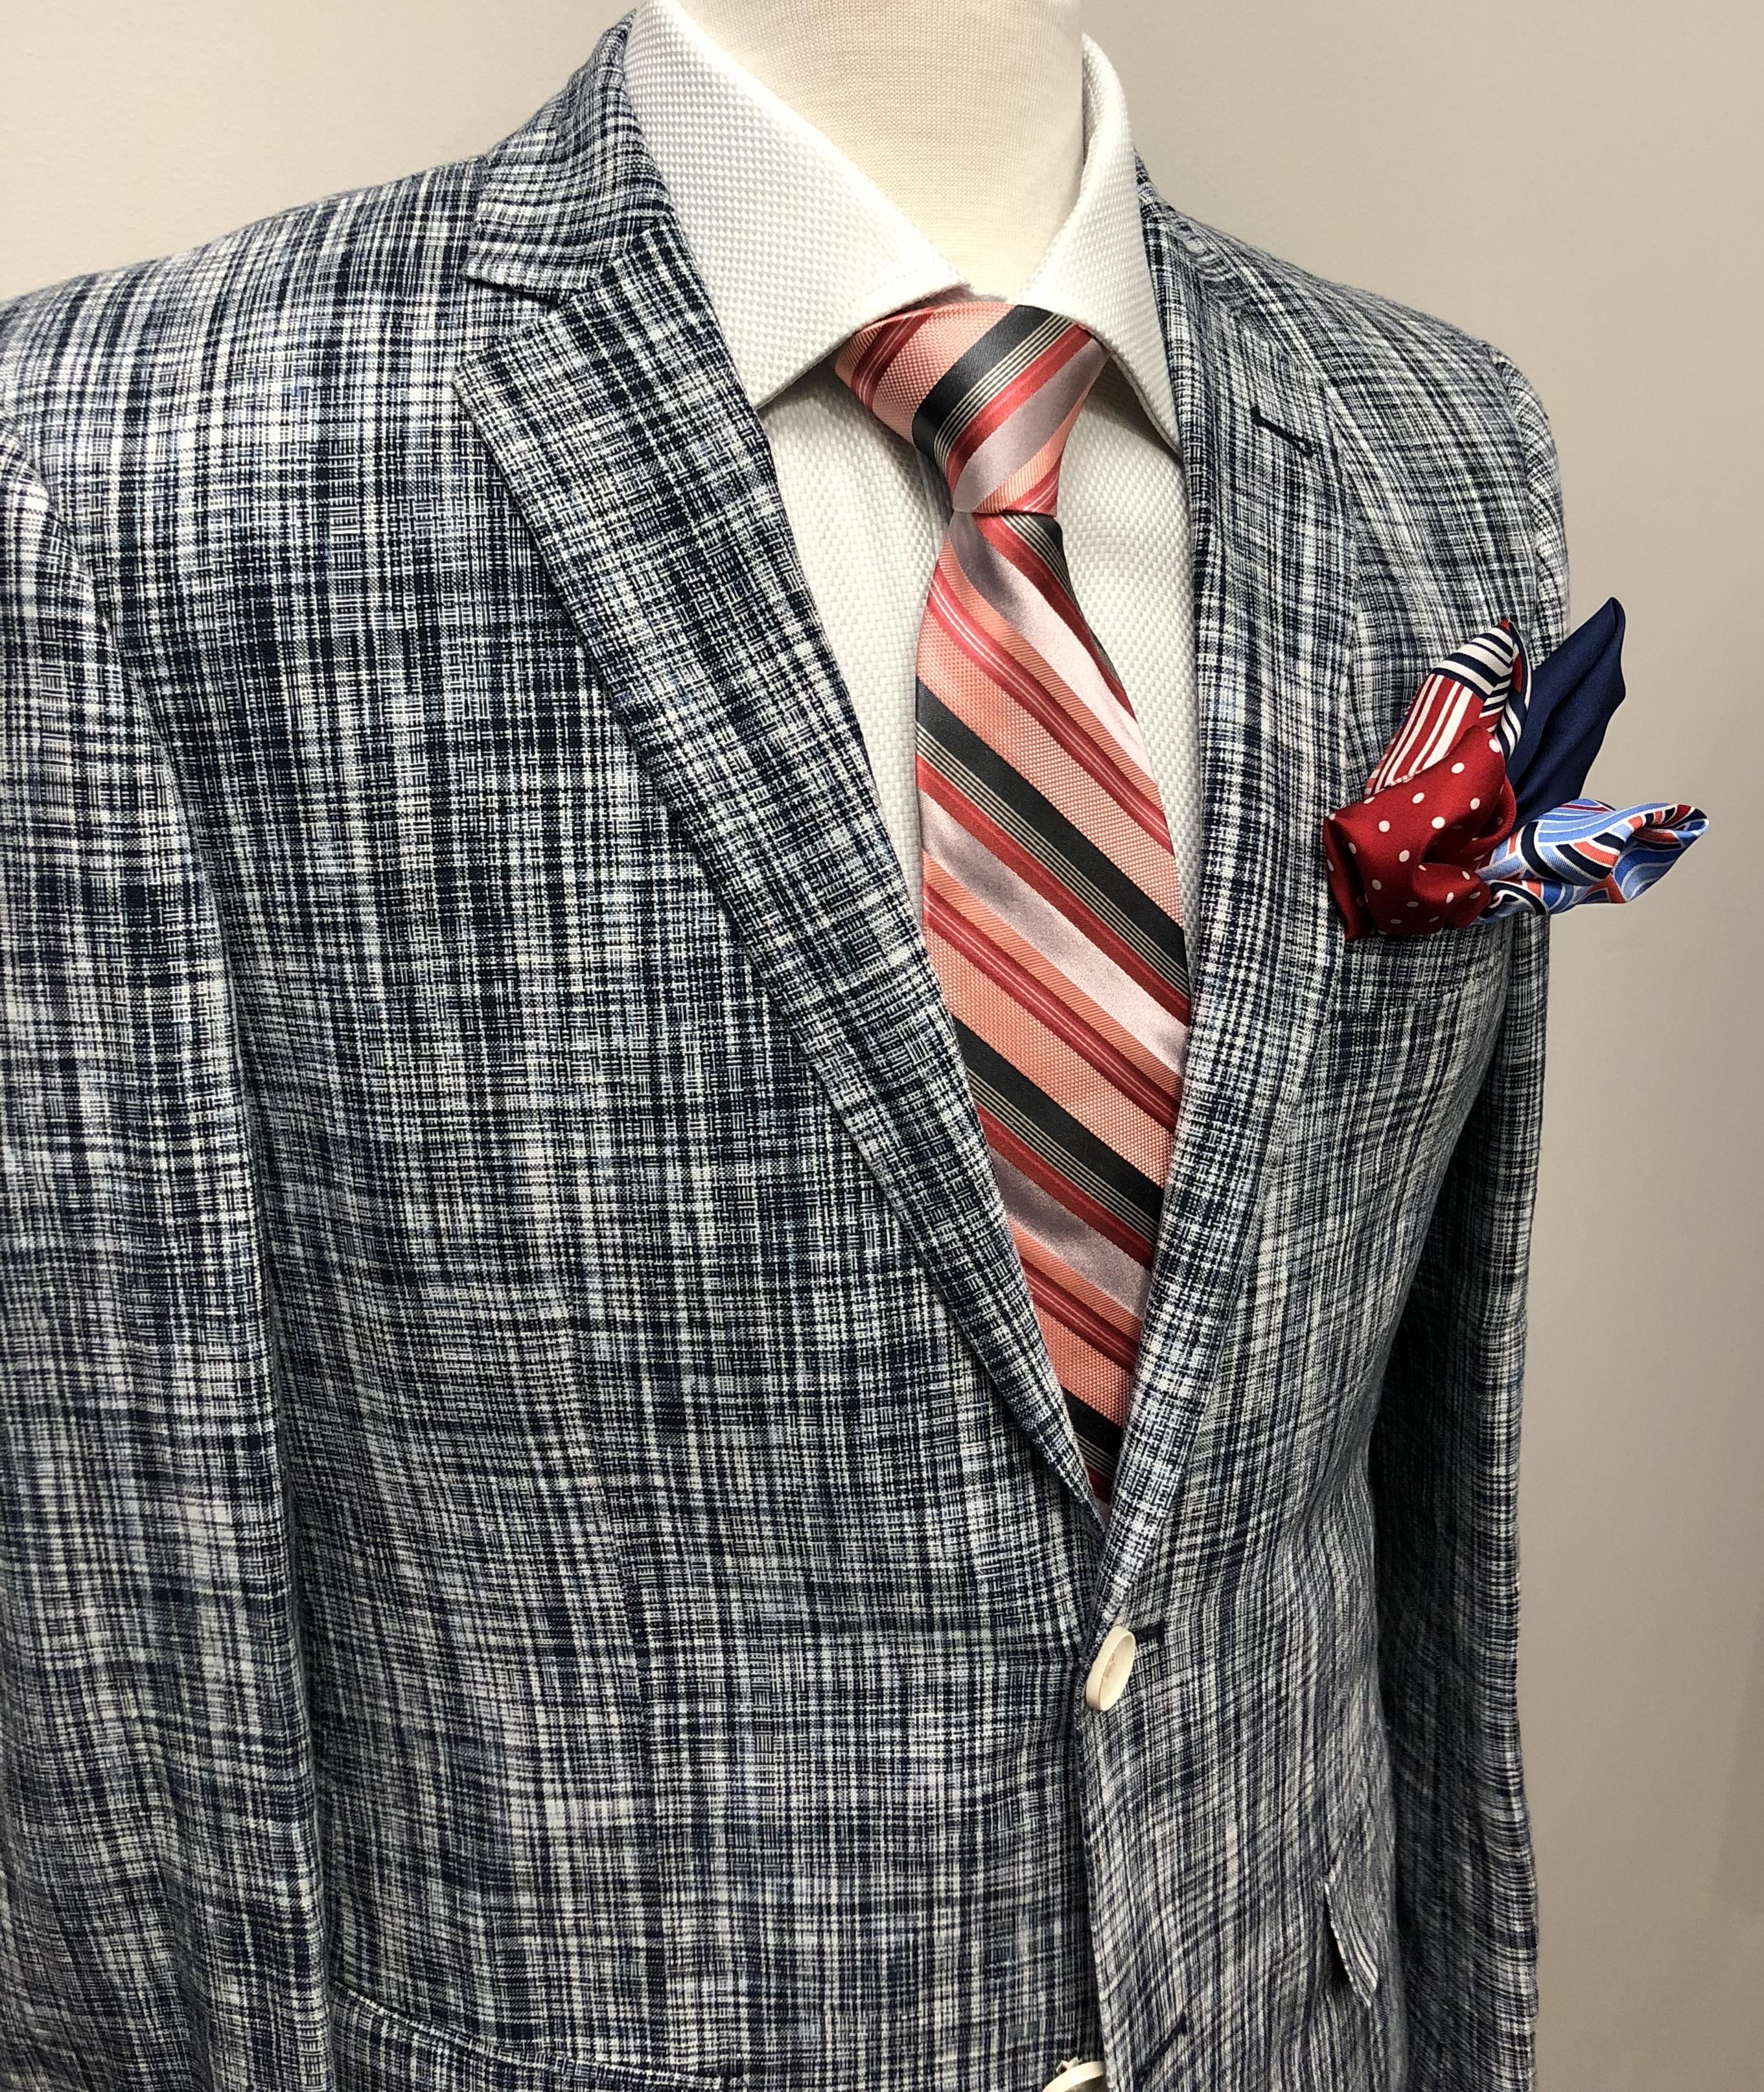 sportcoat texture - Copy